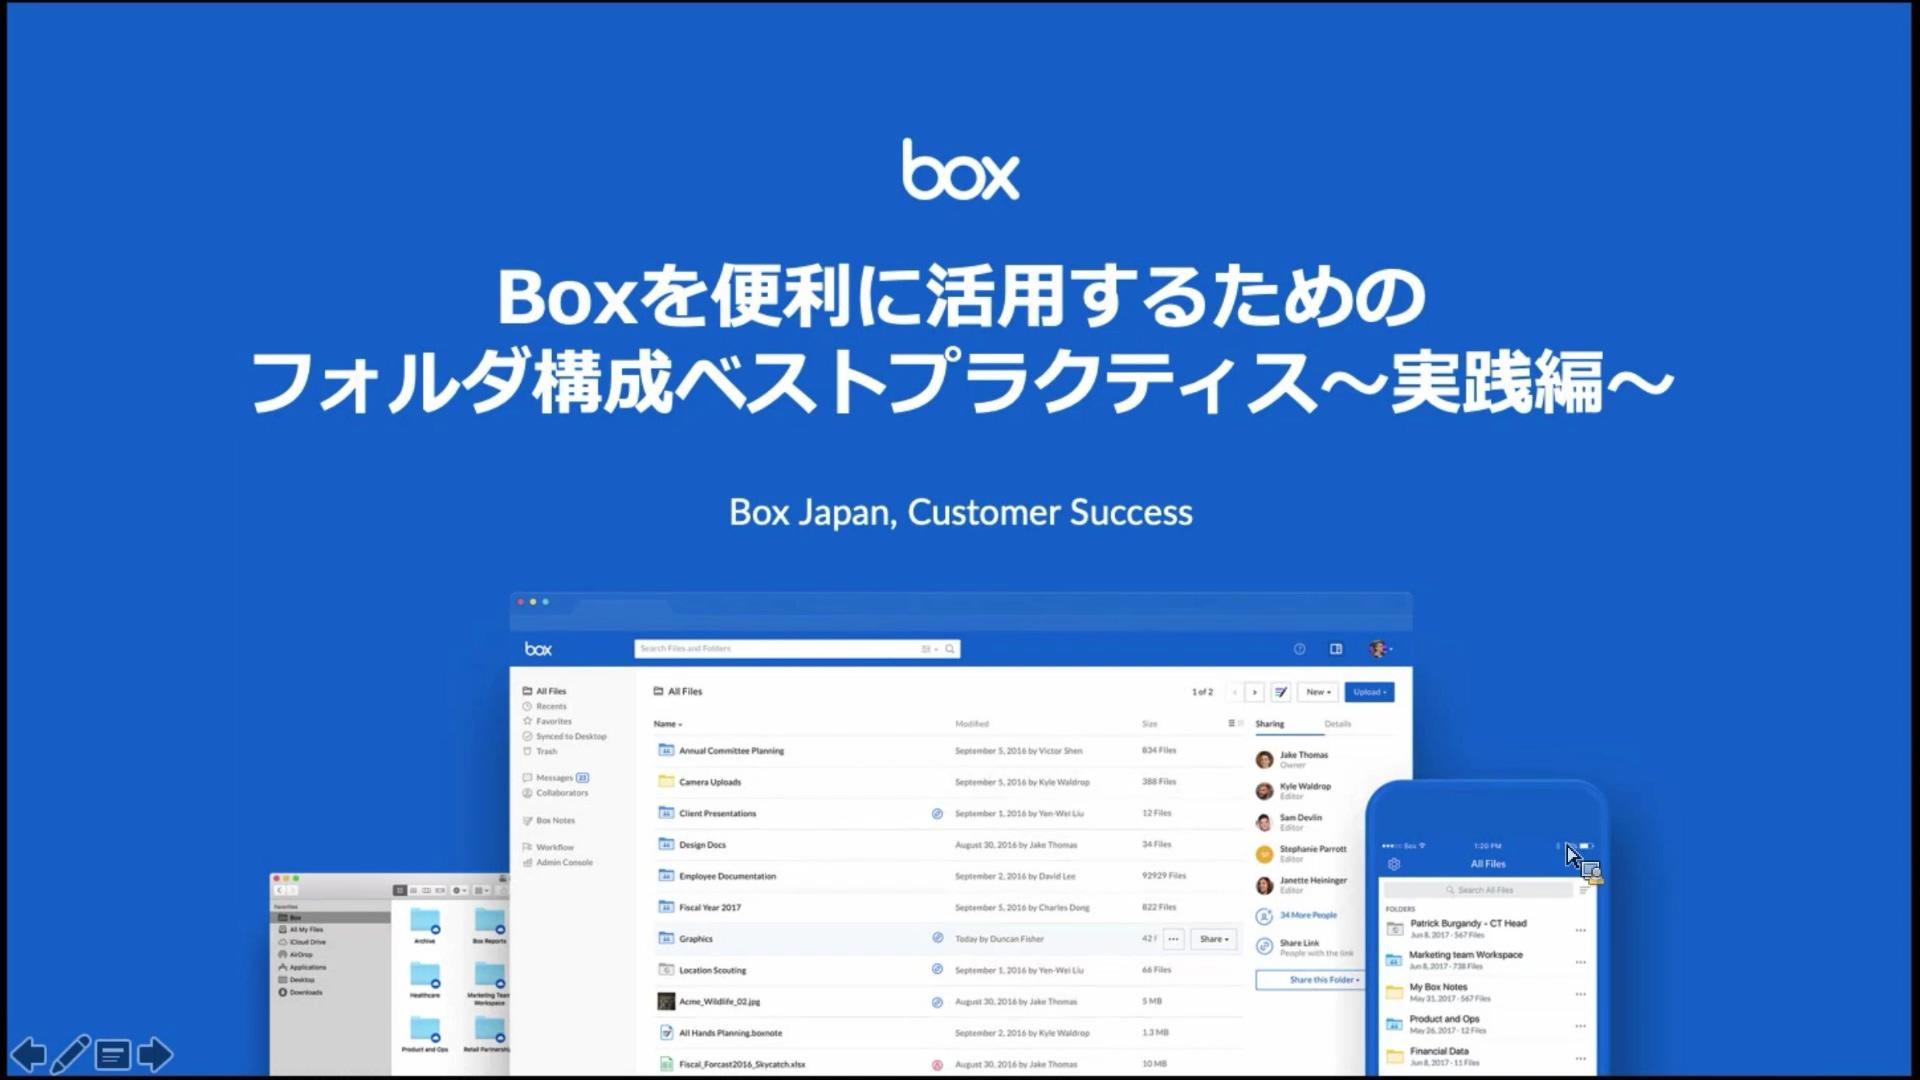 box-online-seminar-20190802